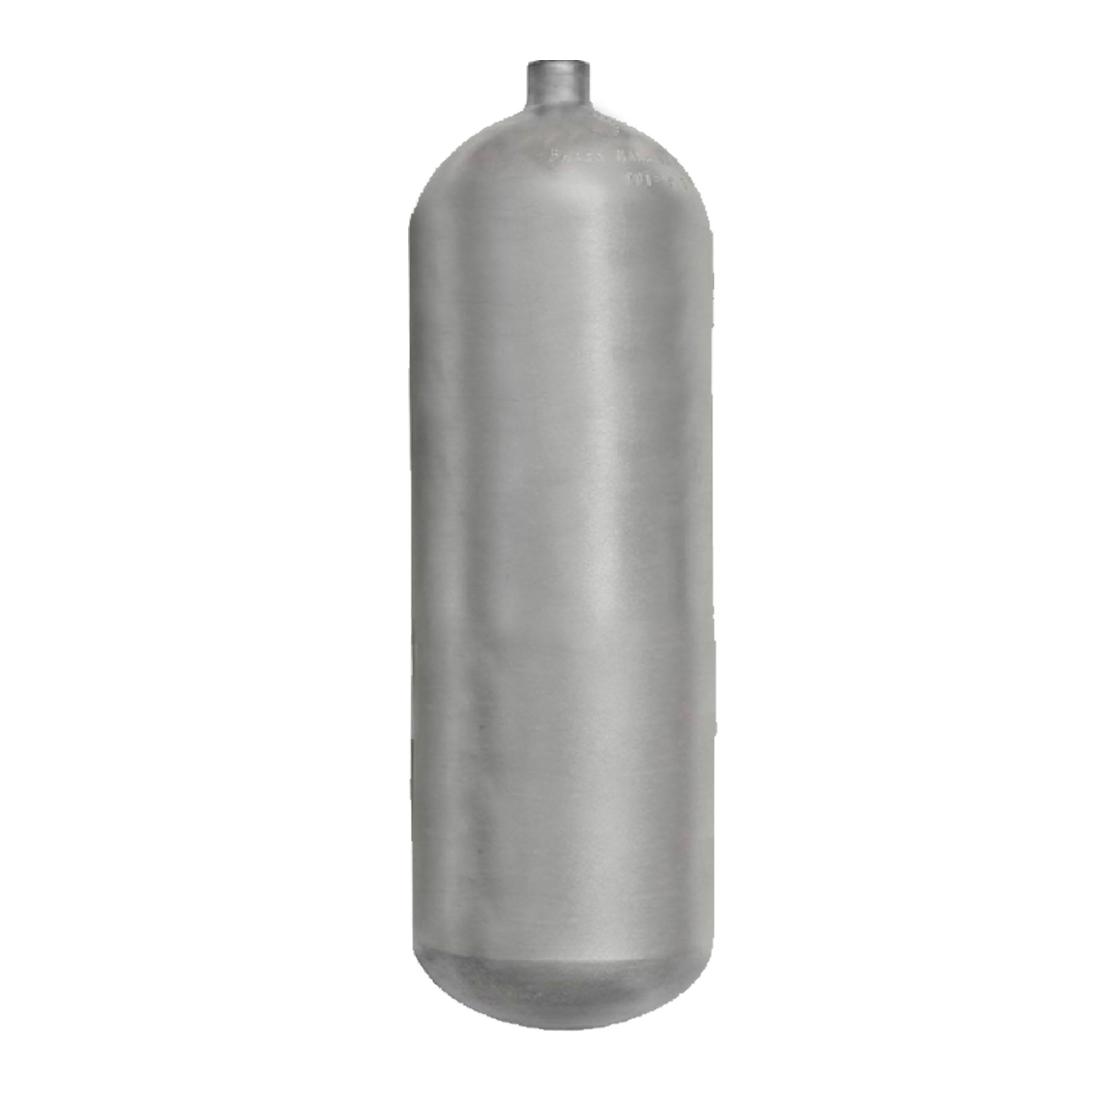 FABER - Tauchgerät 232Bar SteelBeast ohne Ventil+Fuß